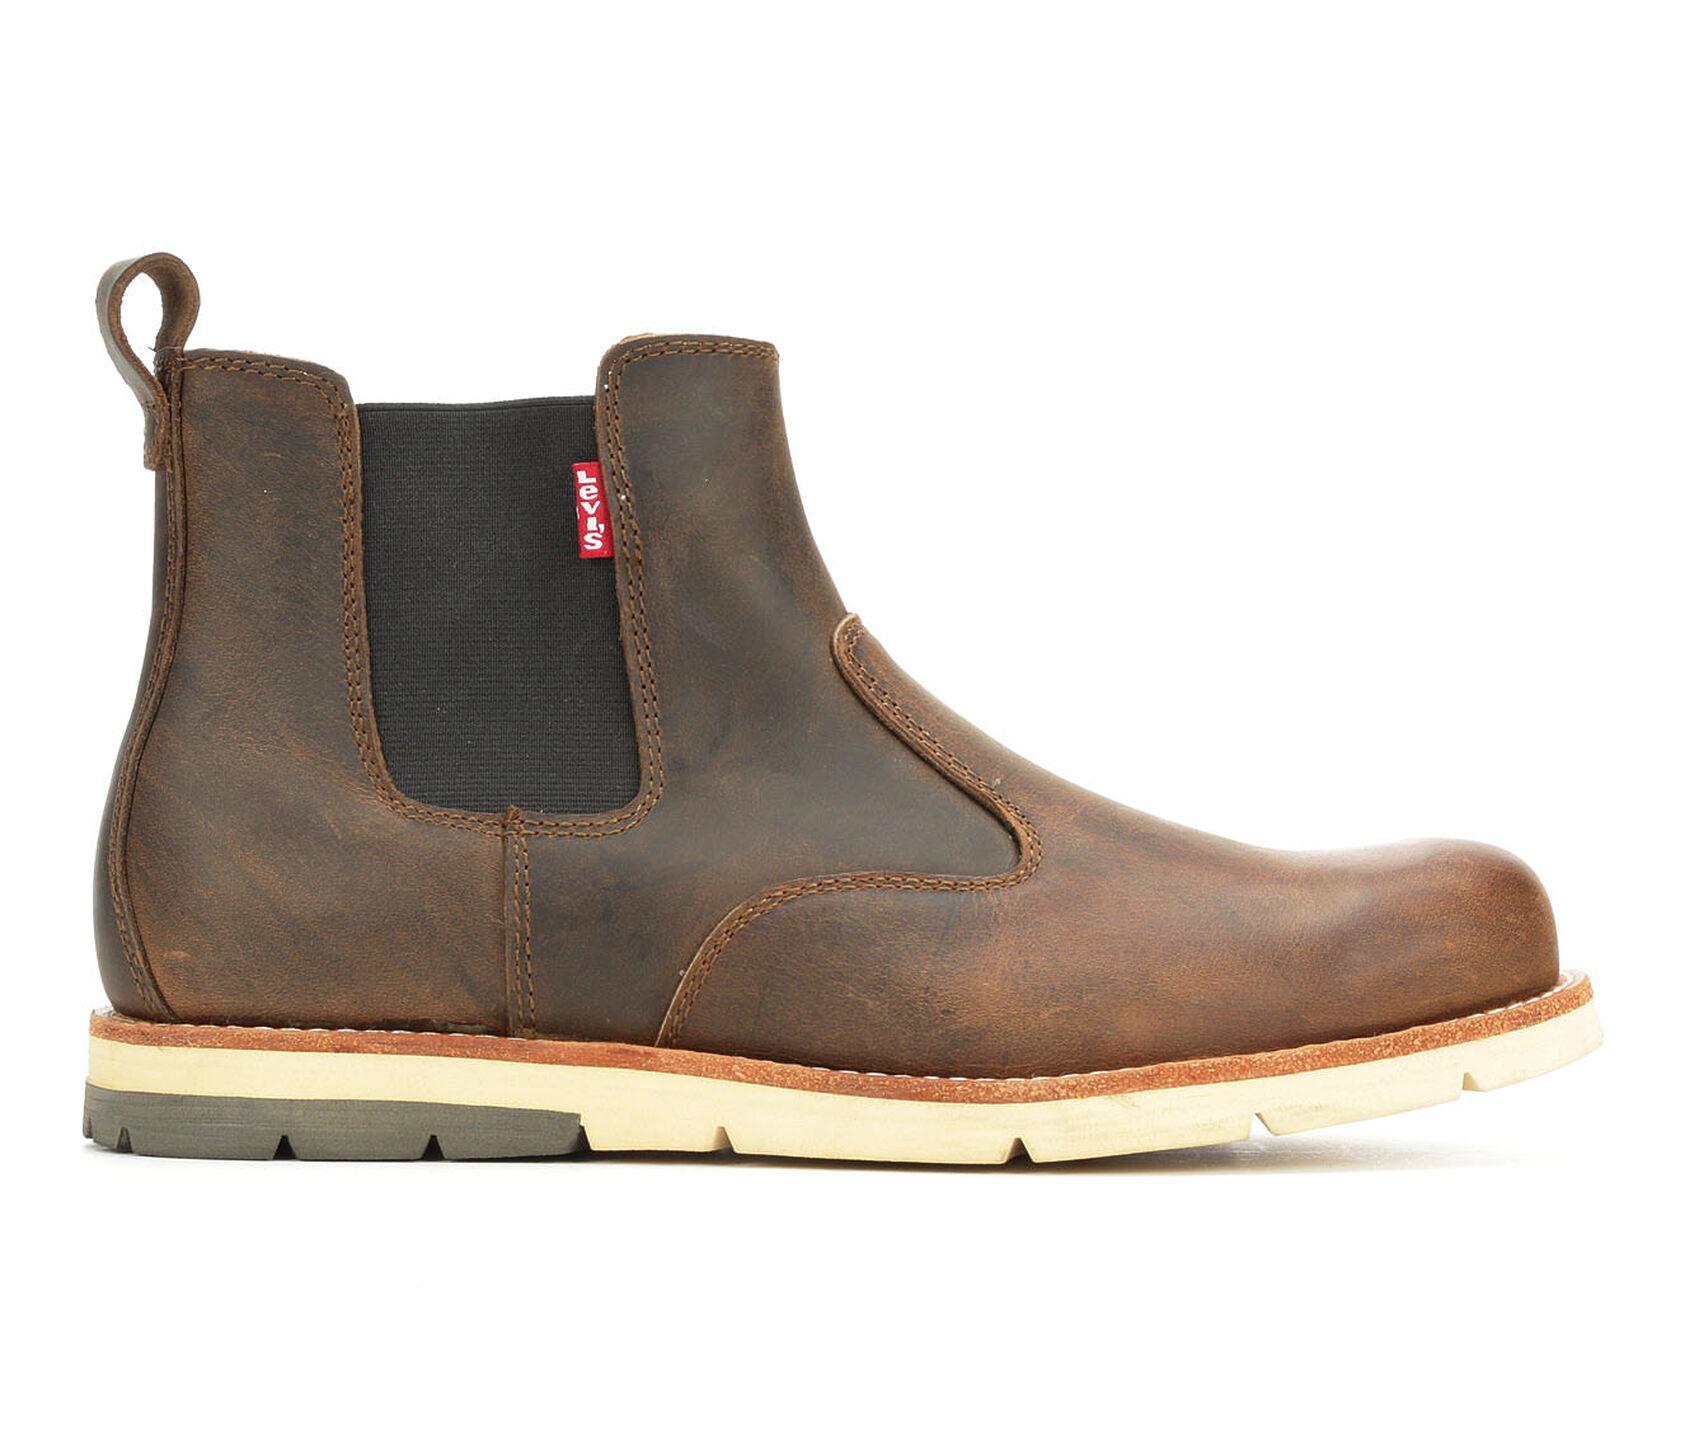 abeafe831f8 Men's Levis Chelsea Logger Boots